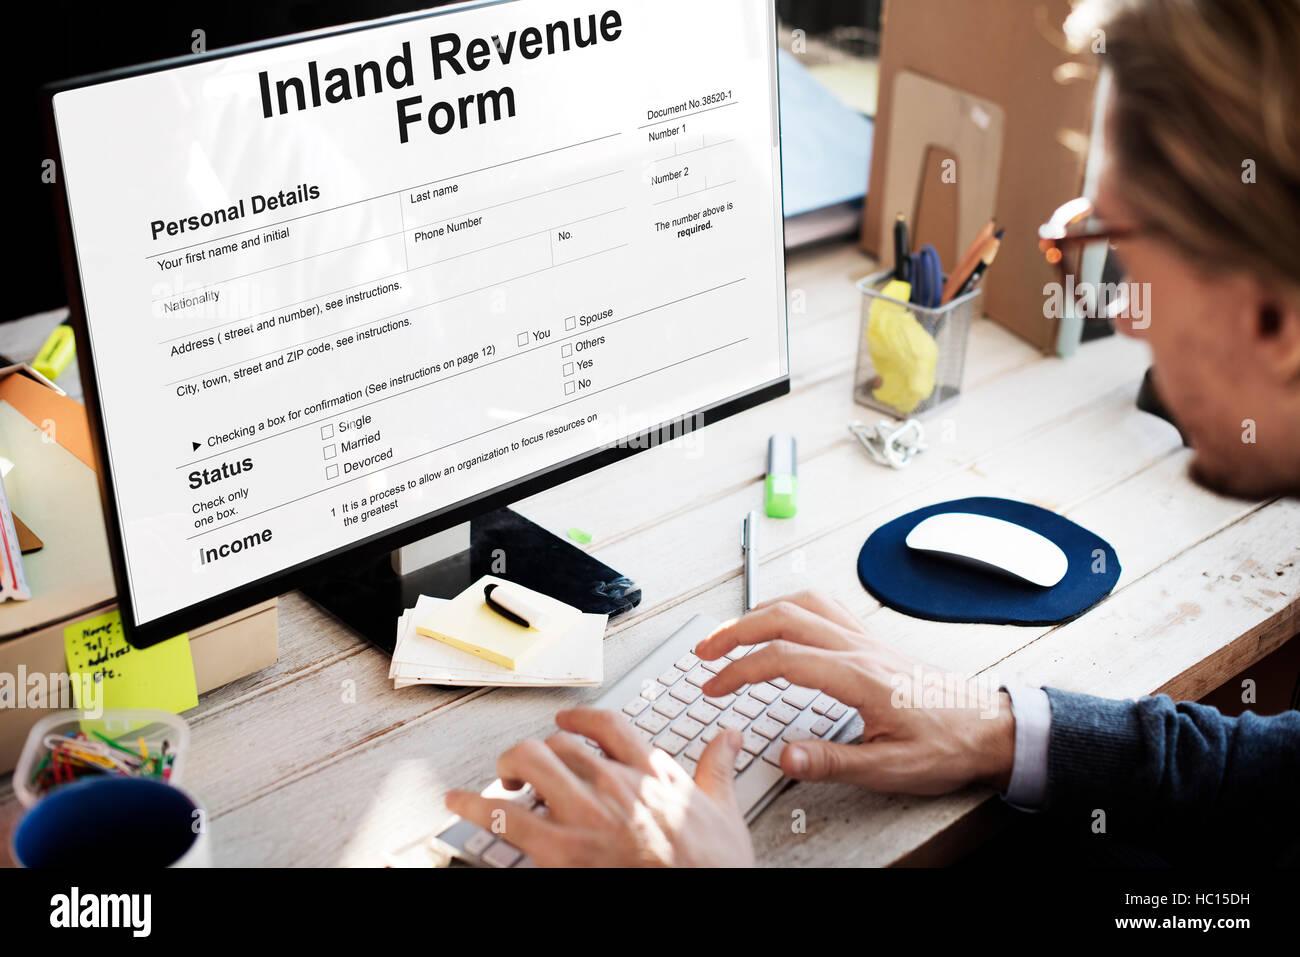 Inland Revenue Form Details Concept - Stock Image